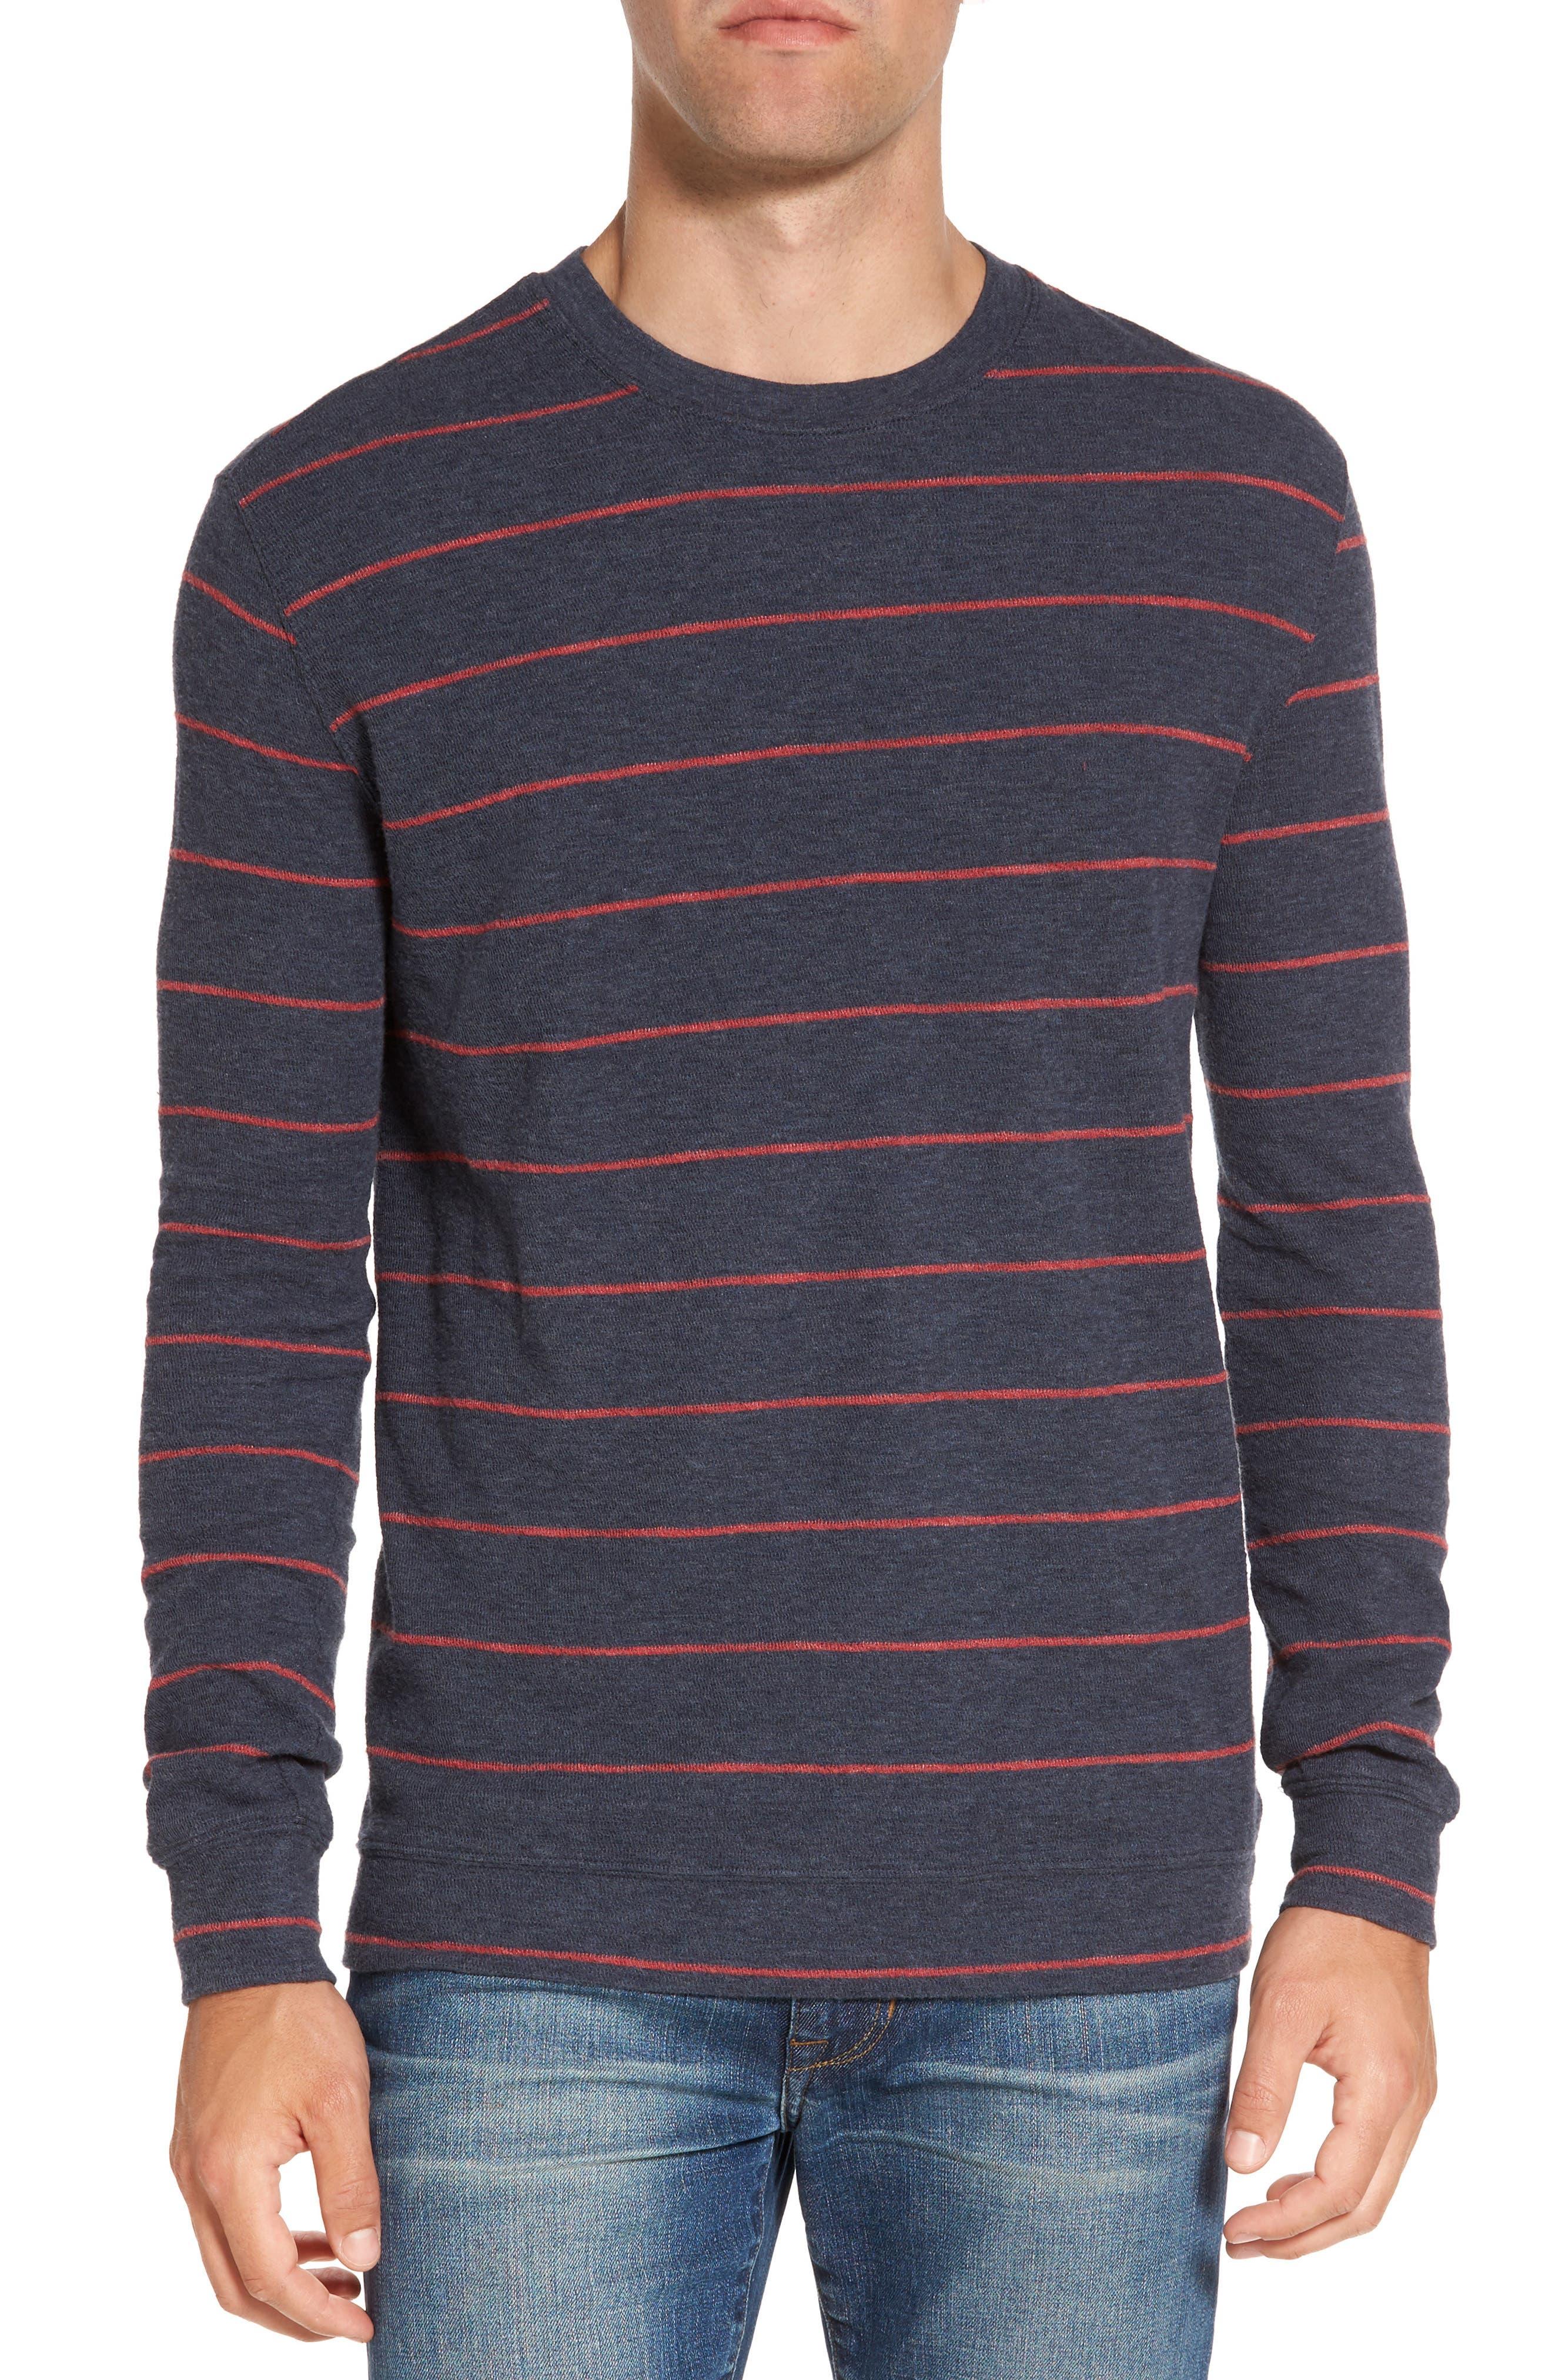 Baird Stripe Crewneck Sweatshirt,                             Main thumbnail 1, color,                             Navy / Red